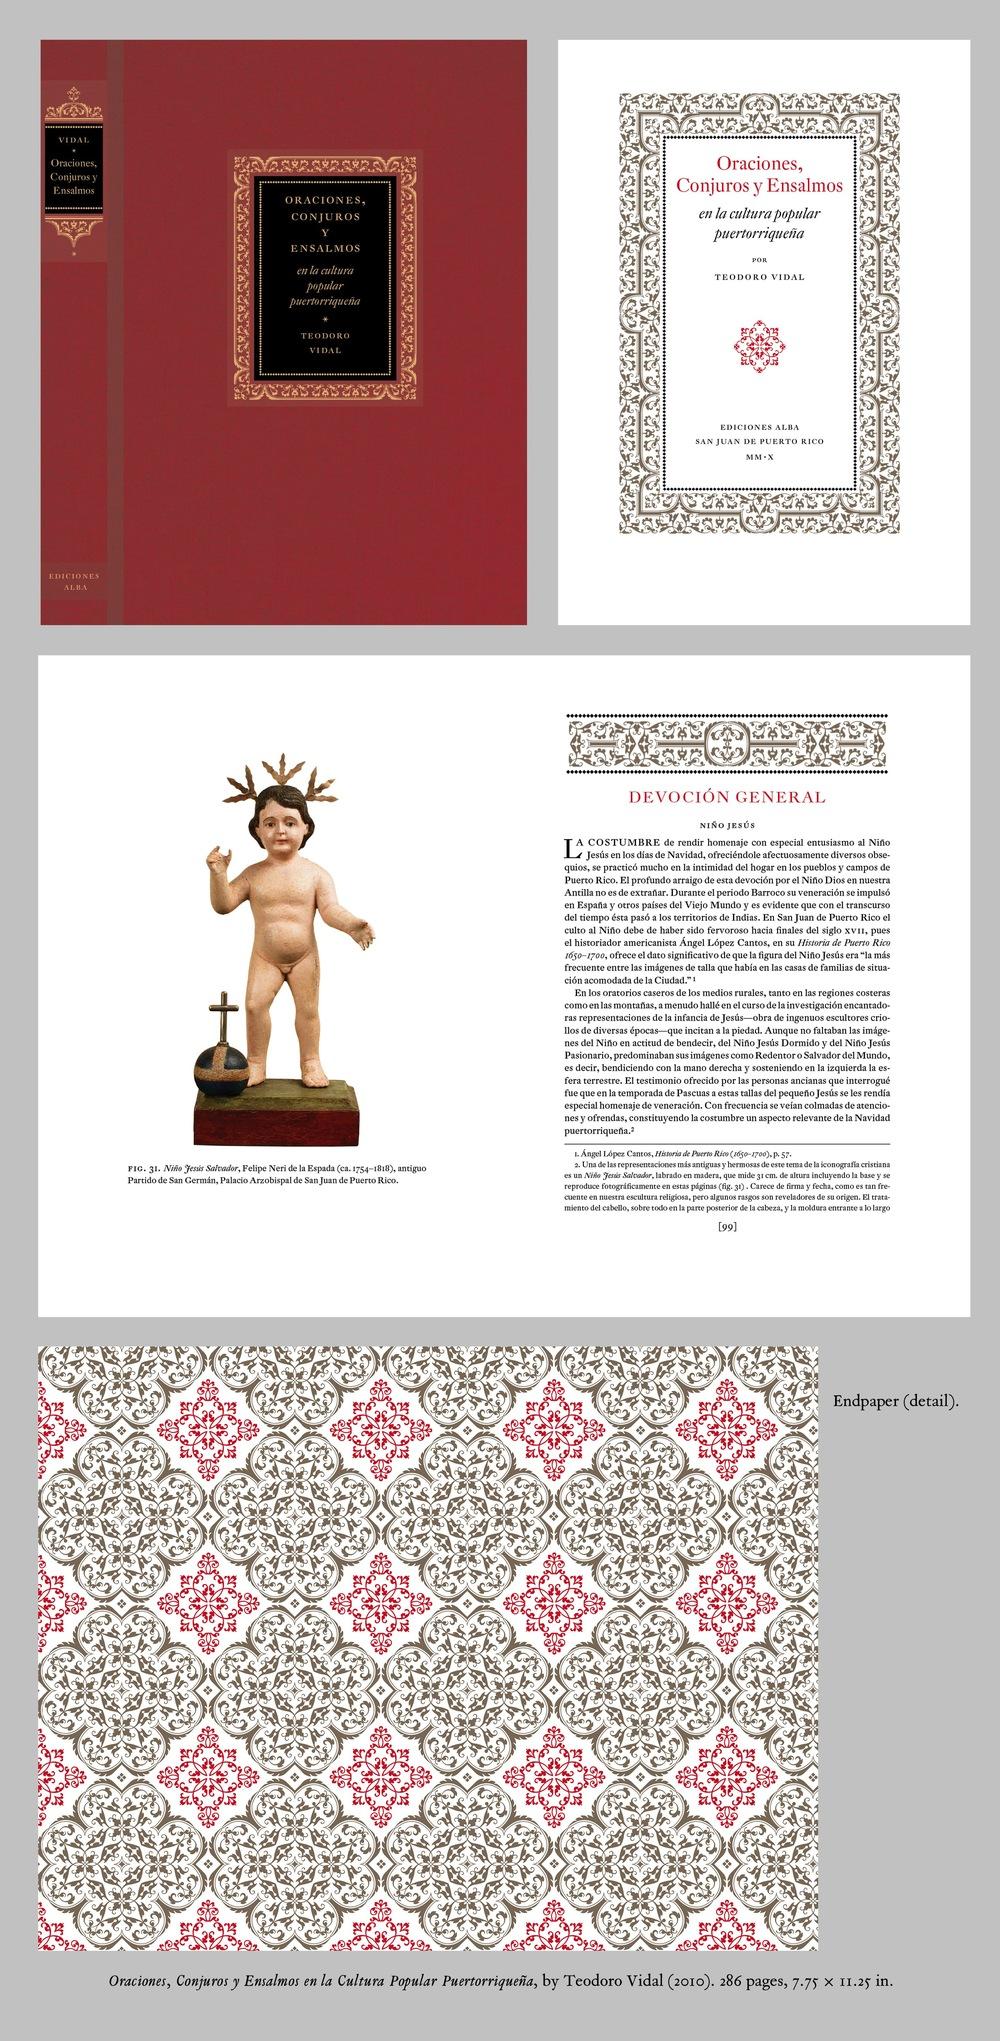 web layout 3.jpg